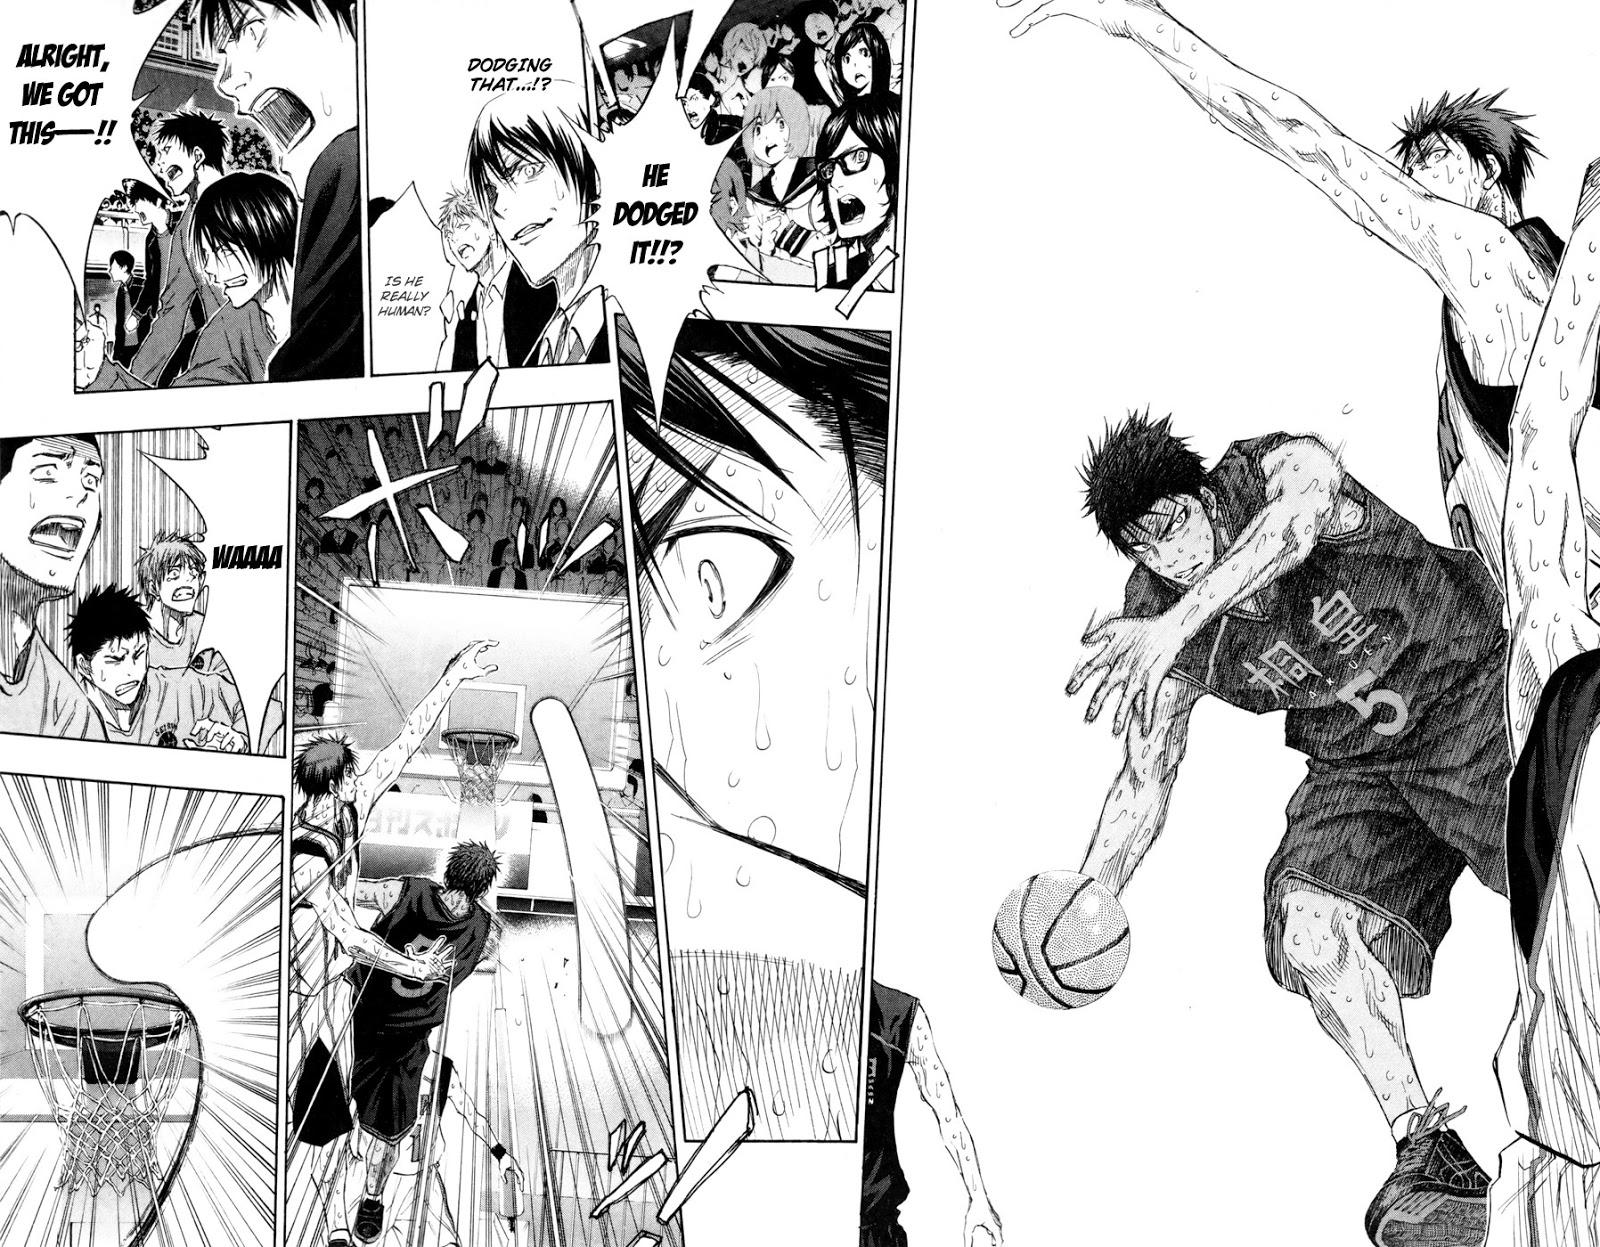 Kuroko no Basket Manga Chapter 132 - Image 08-08